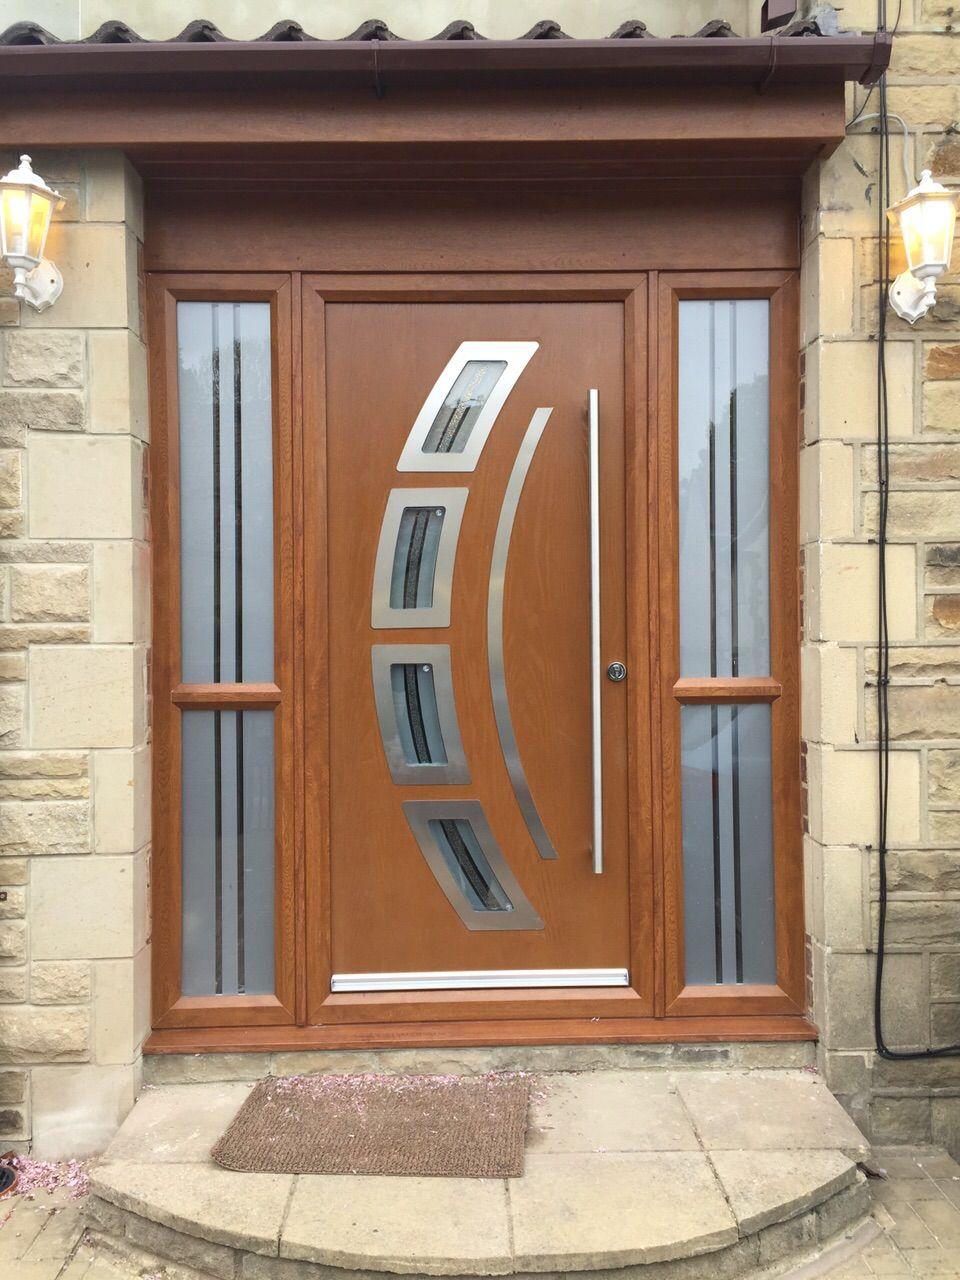 Bespoke Doors & Pin by Timber Door Merchants on External Bespoke Timber Doors ... pezcame.com